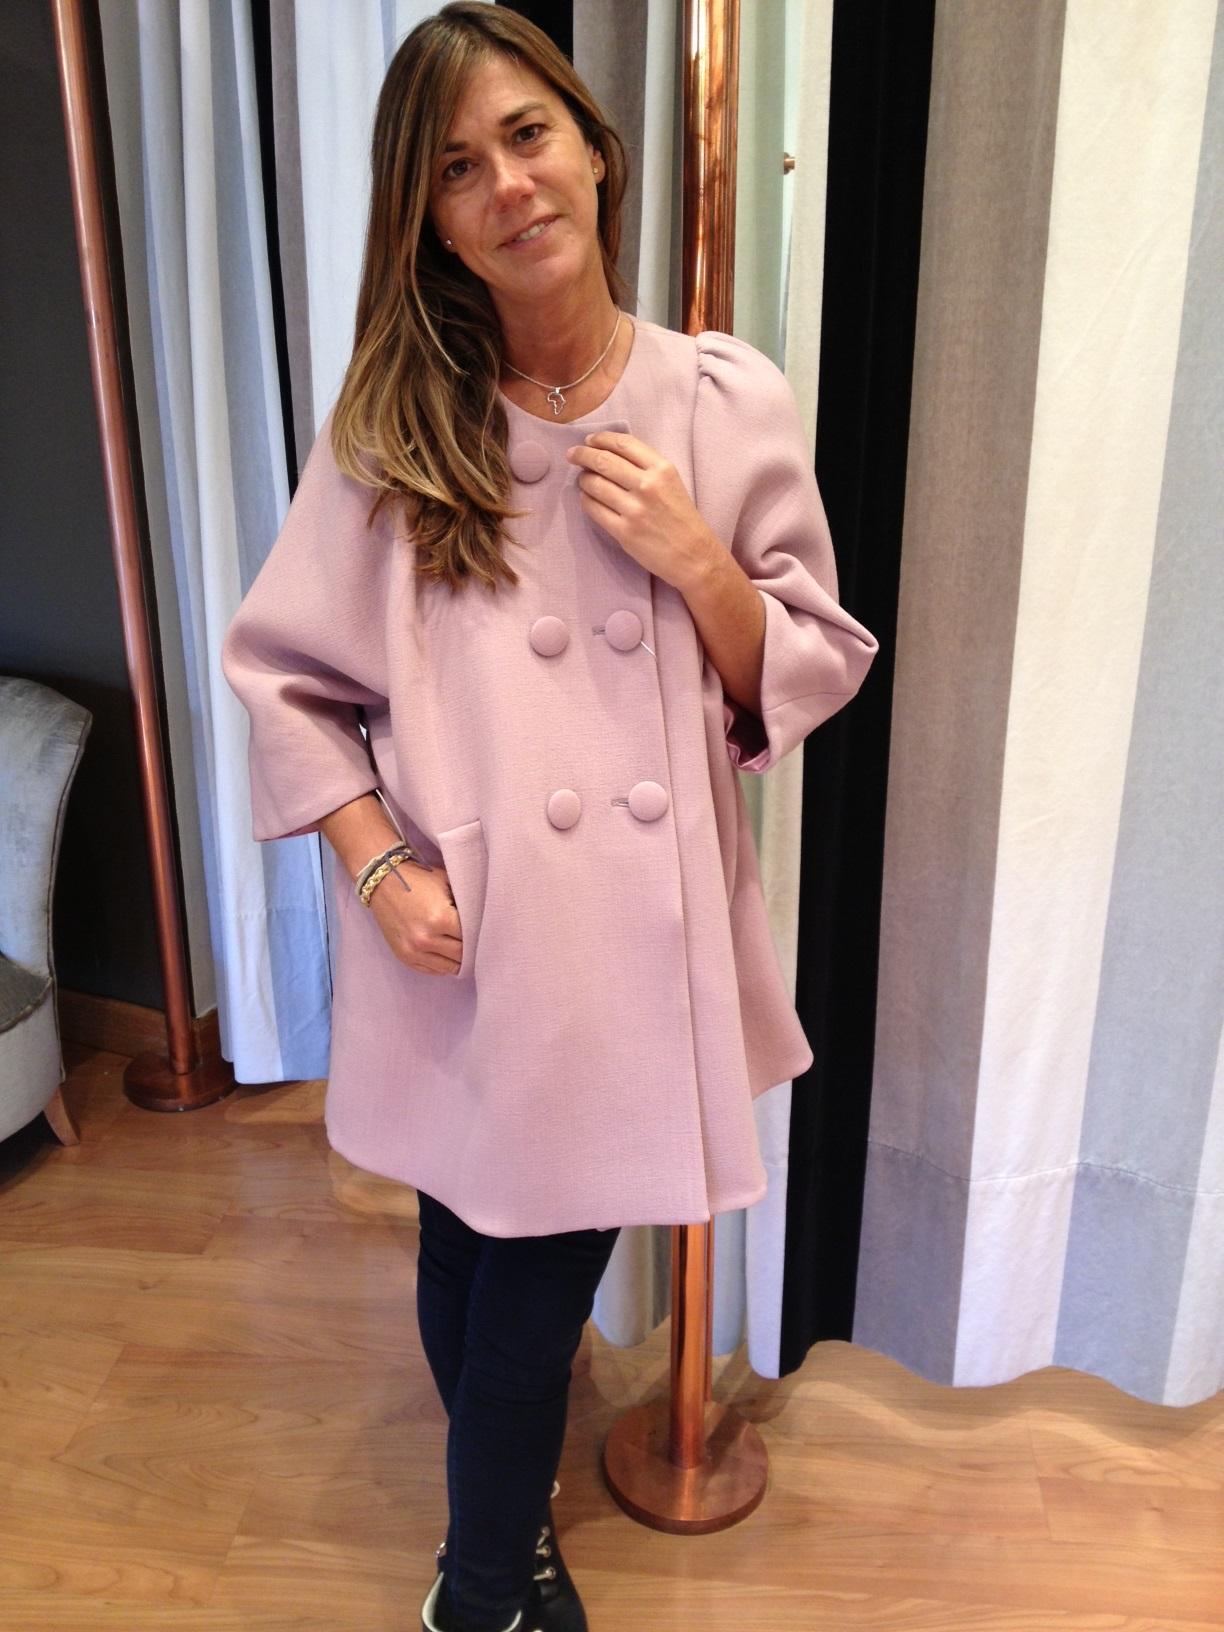 Abrigo Rosa Pastel Setlan moda mujer otoño invierno 2013-14